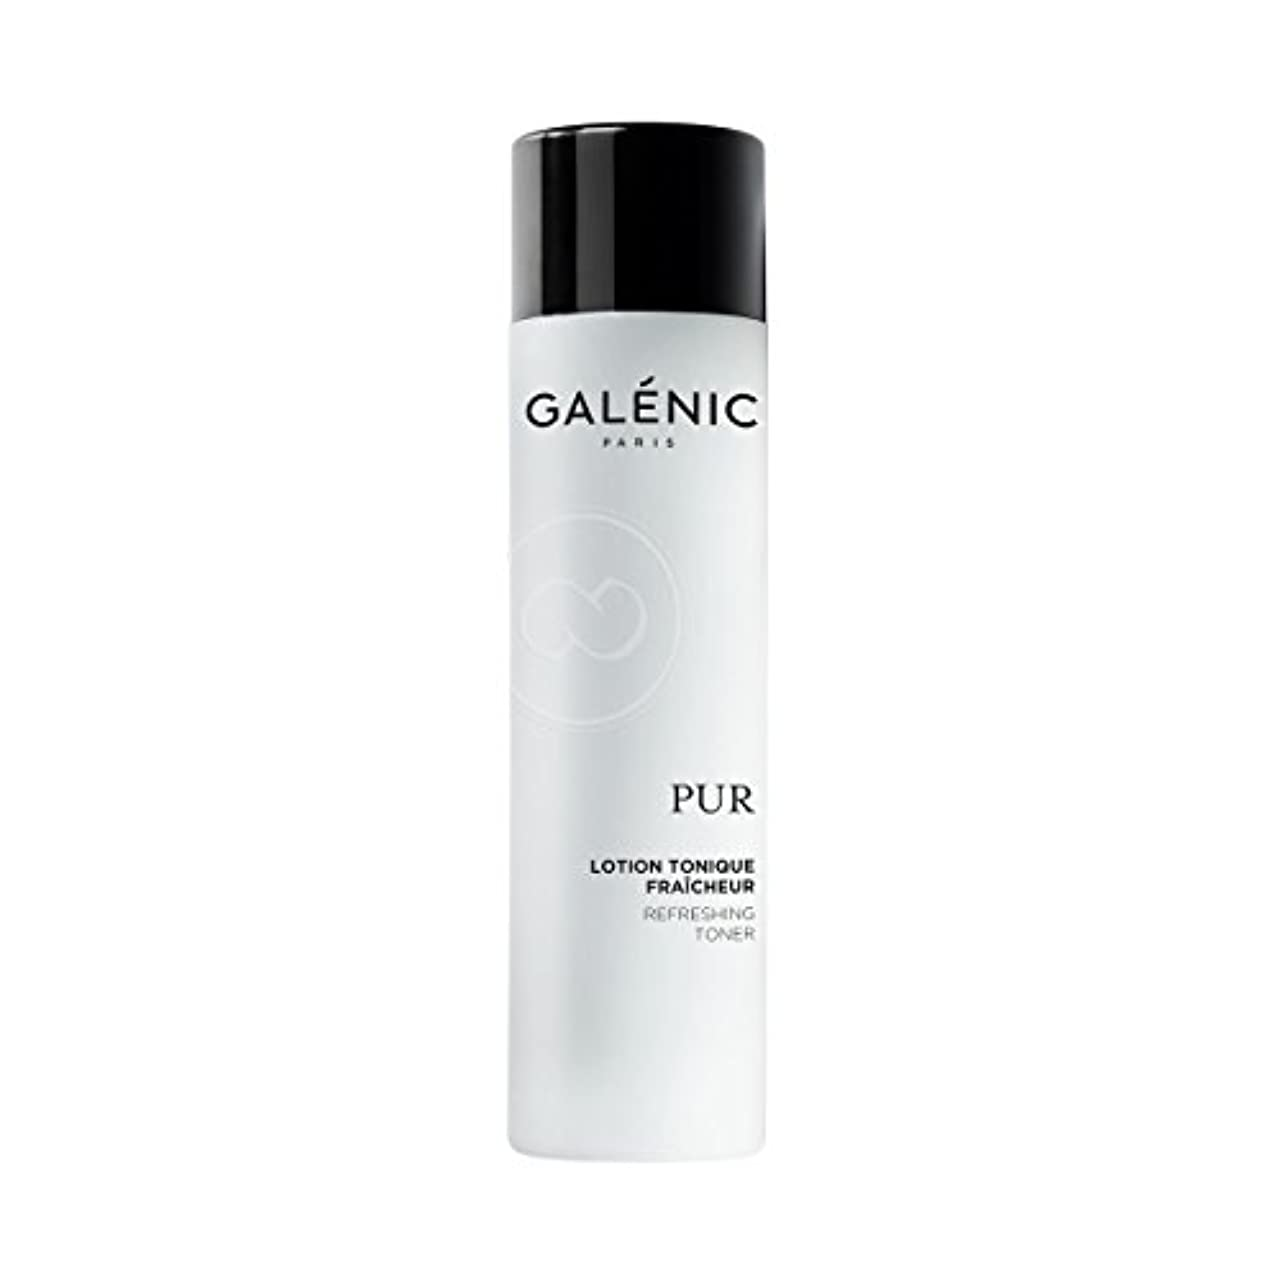 近似成果姓Galenic Pur Refreshing Tonic 200ml [並行輸入品]